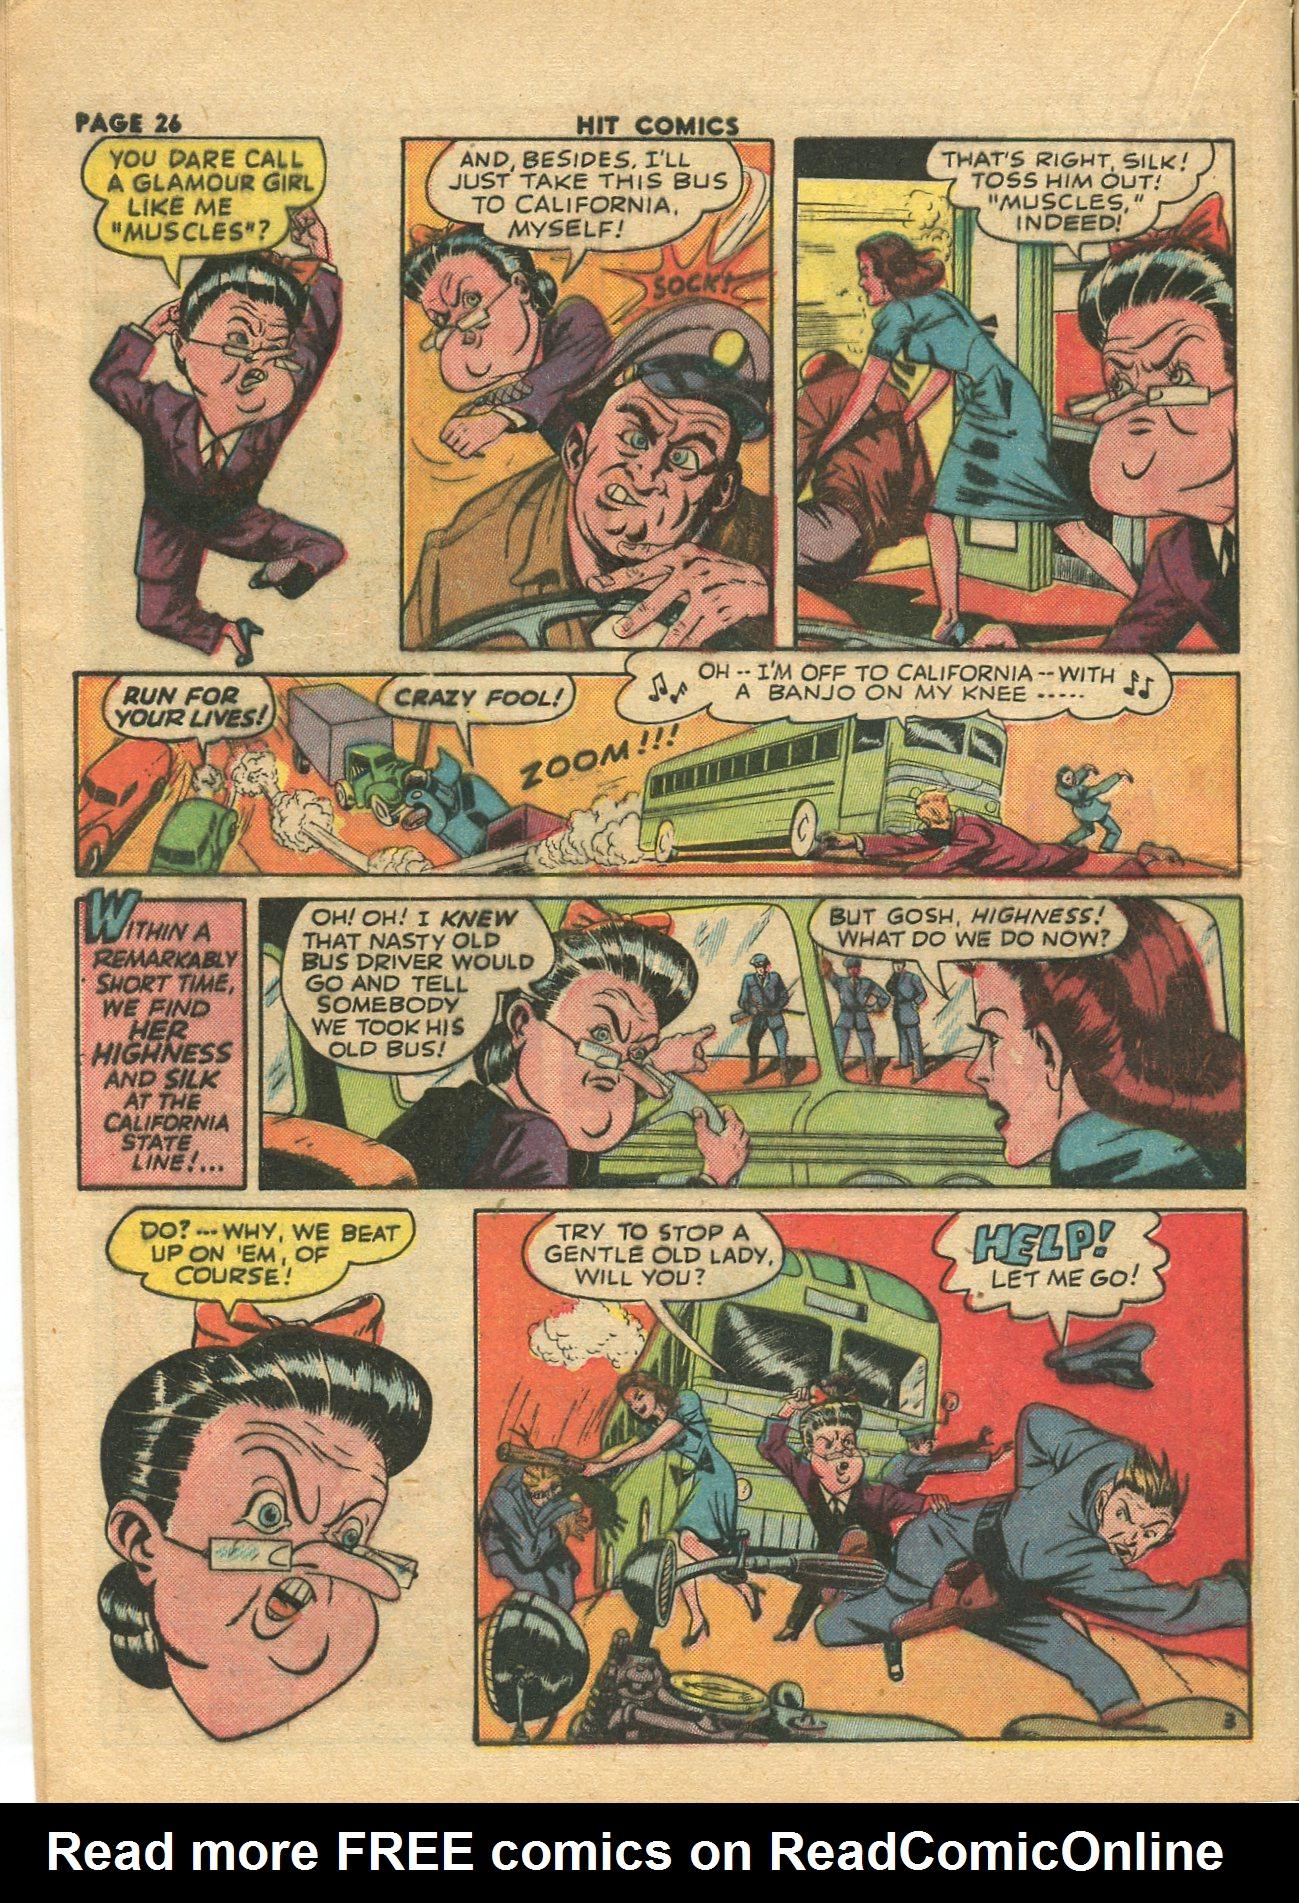 Read online Hit Comics comic -  Issue #28 - 29